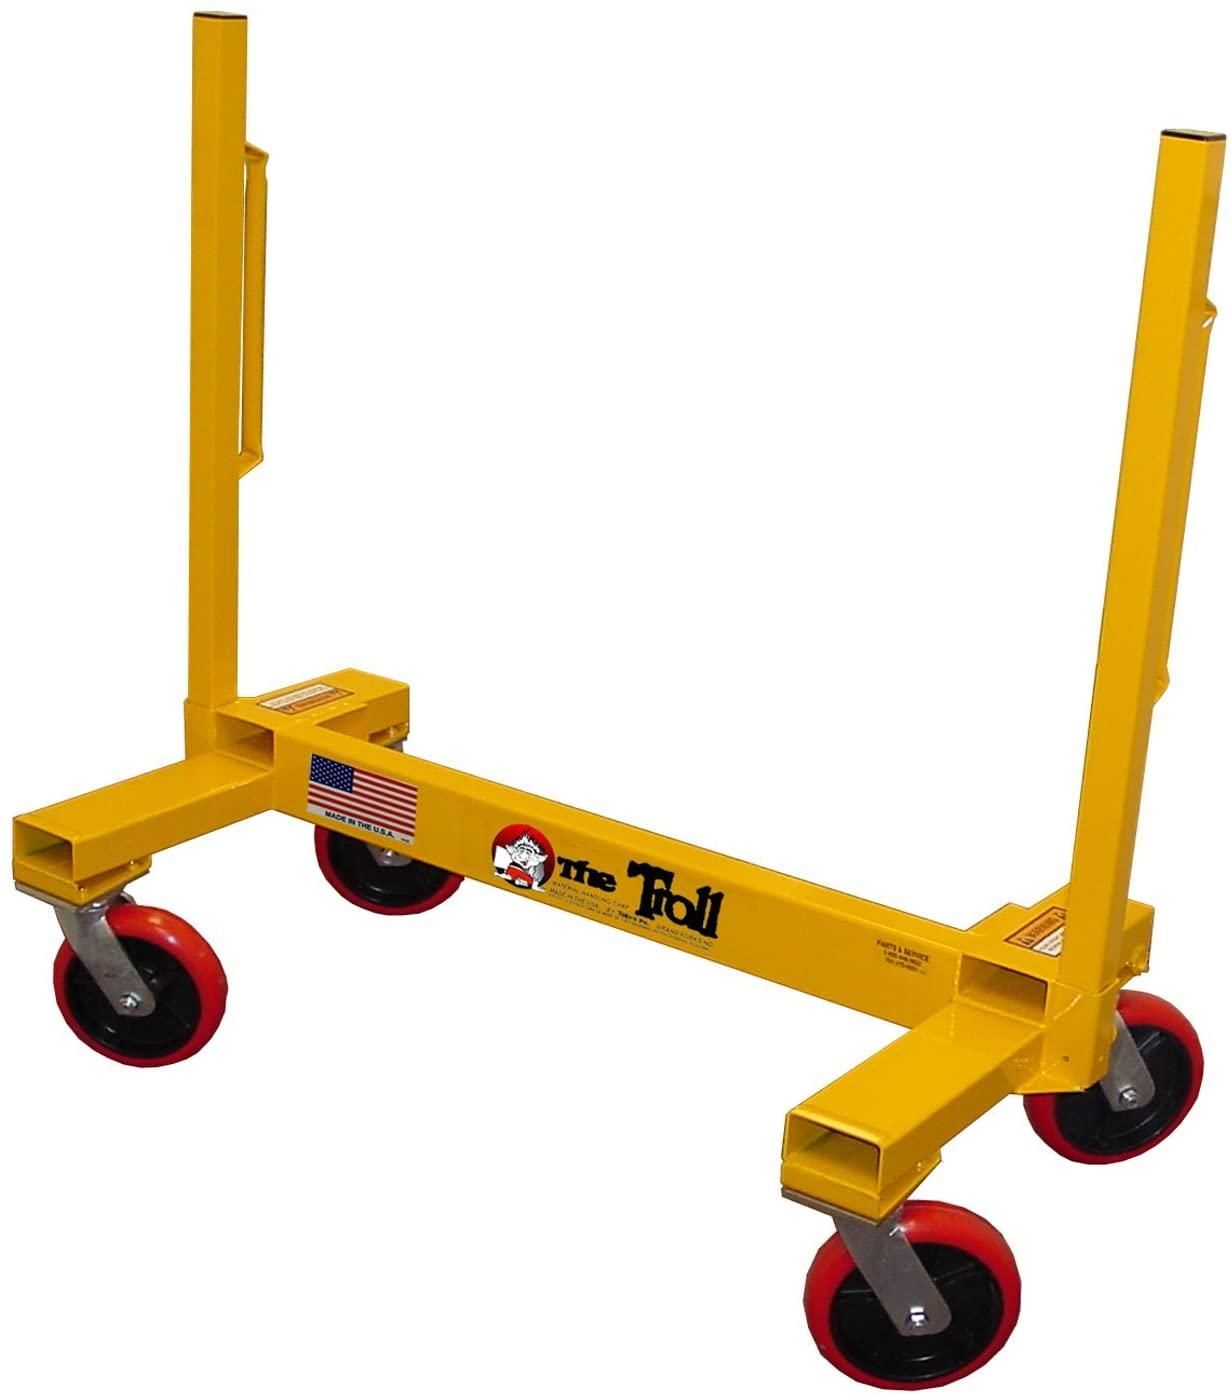 Troll 1814 Material Handling Cart